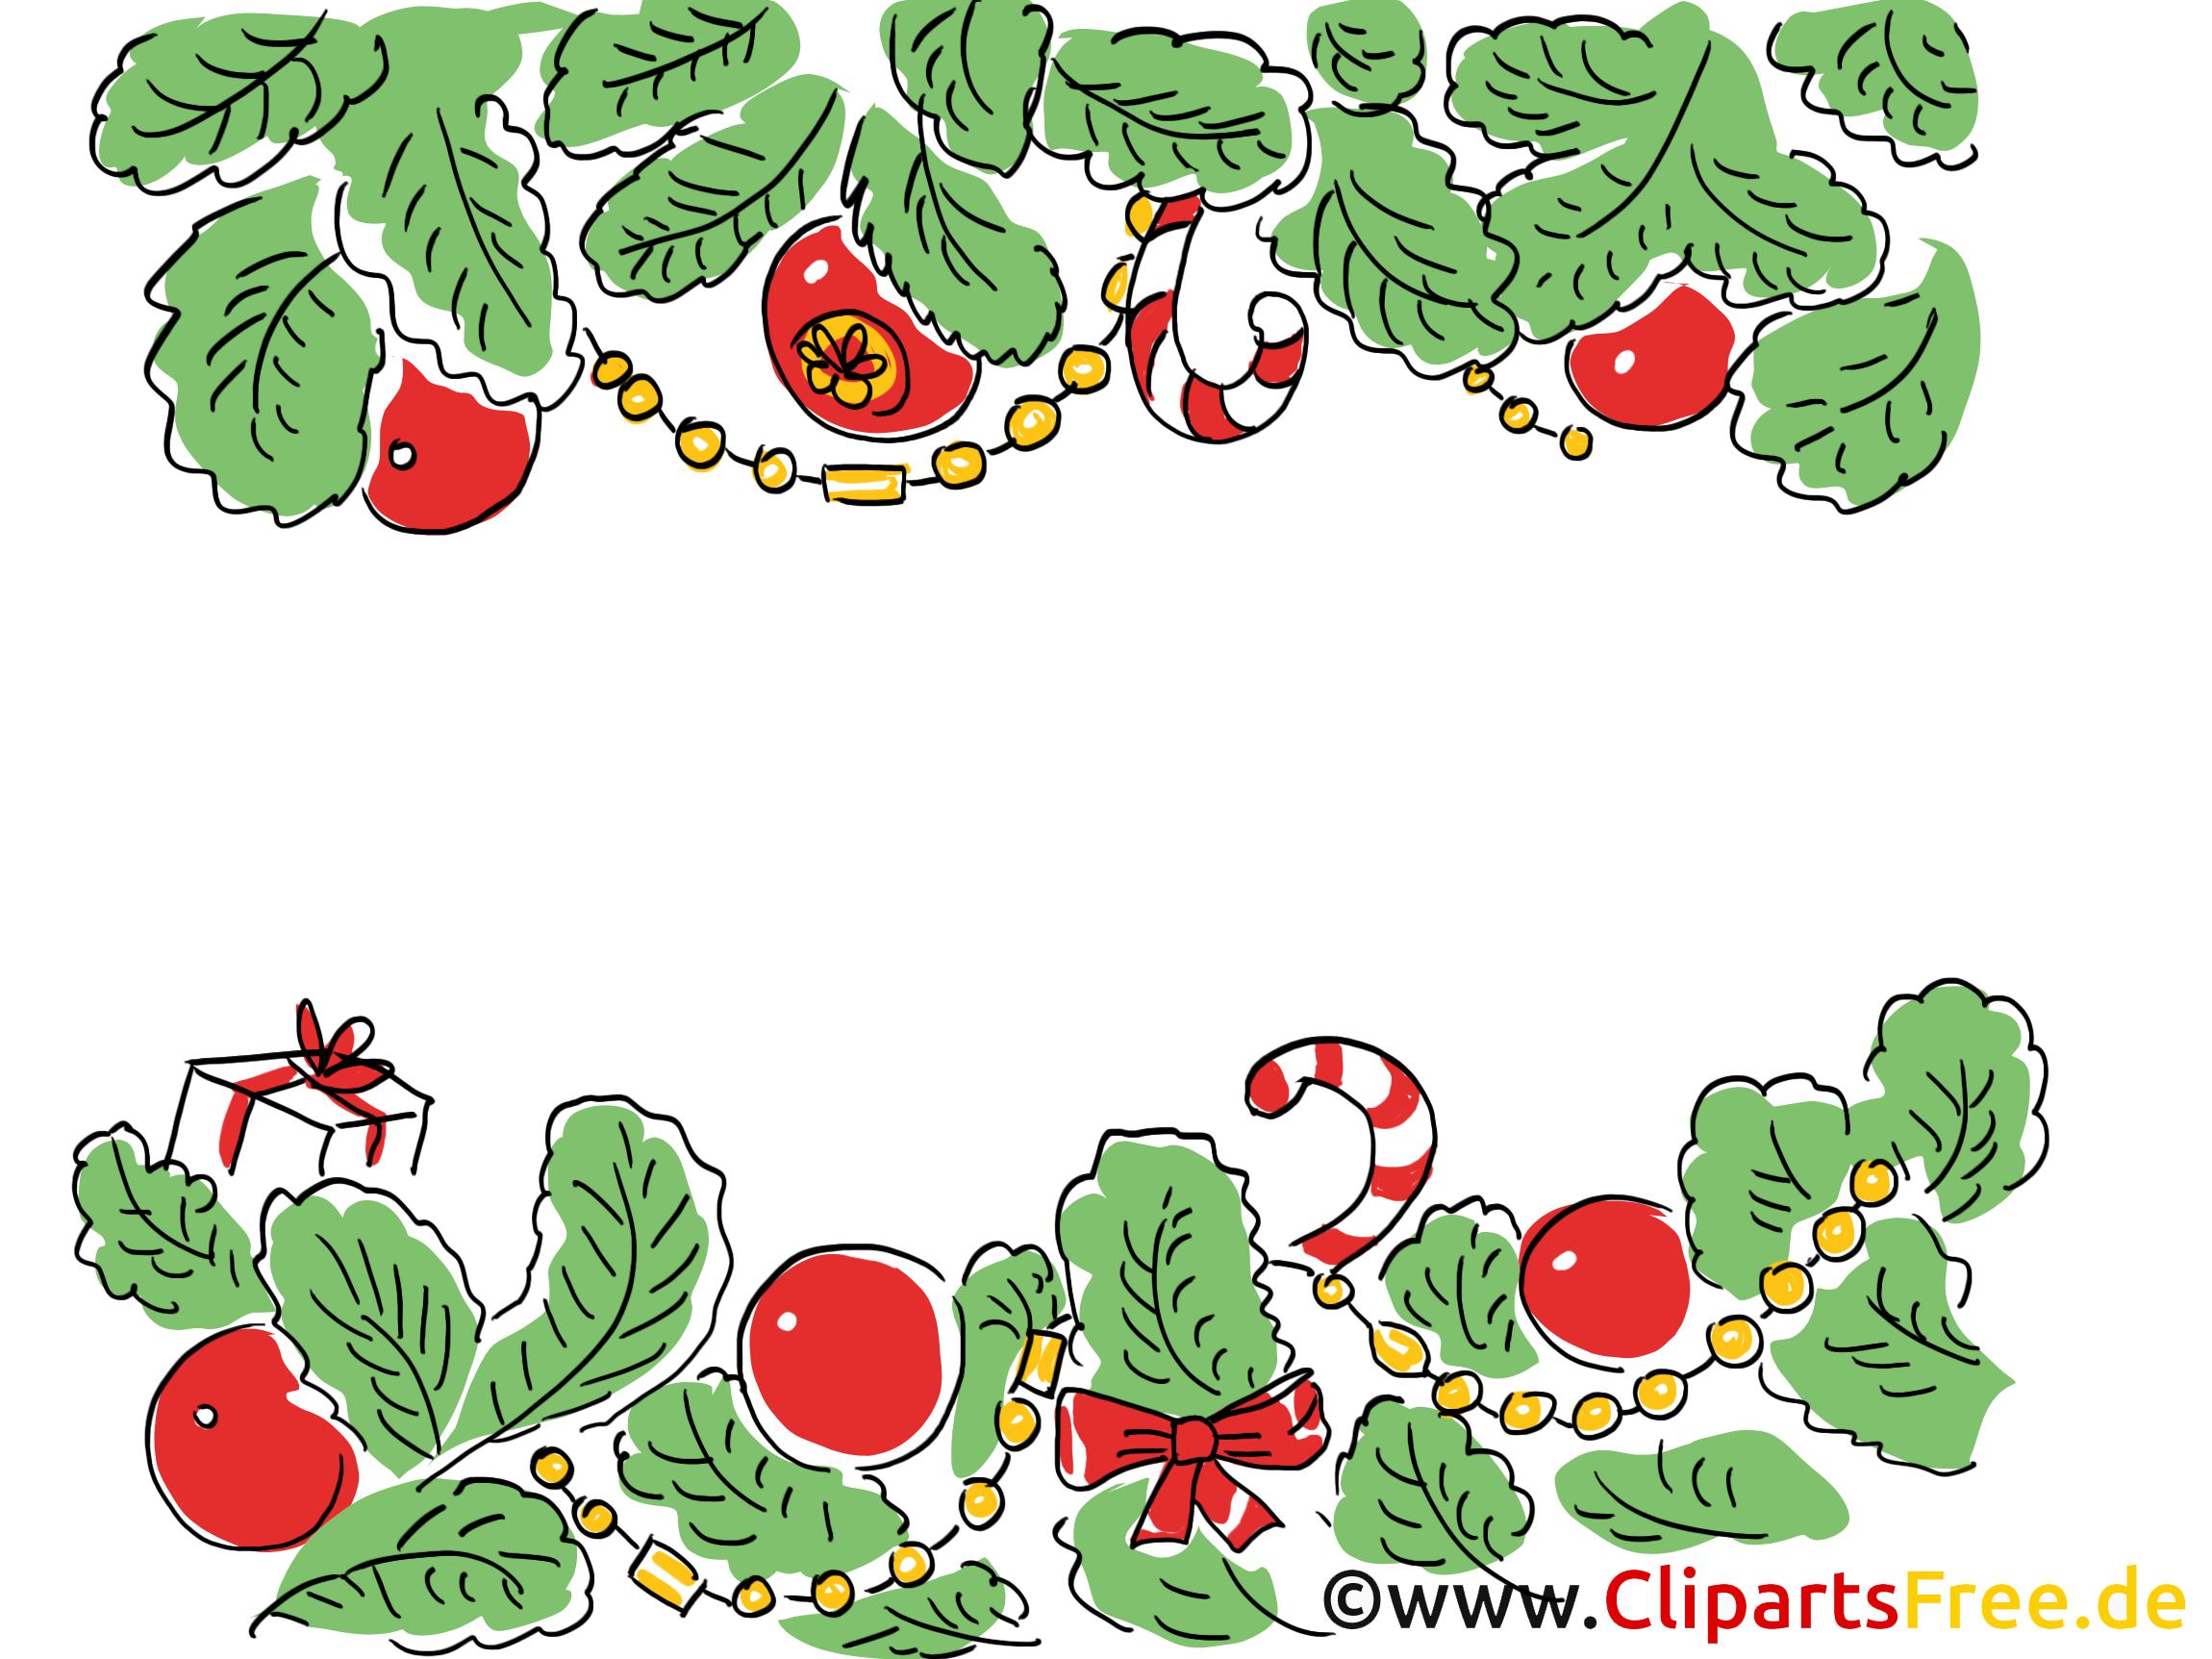 Noël images - Fonds d'écran dessins